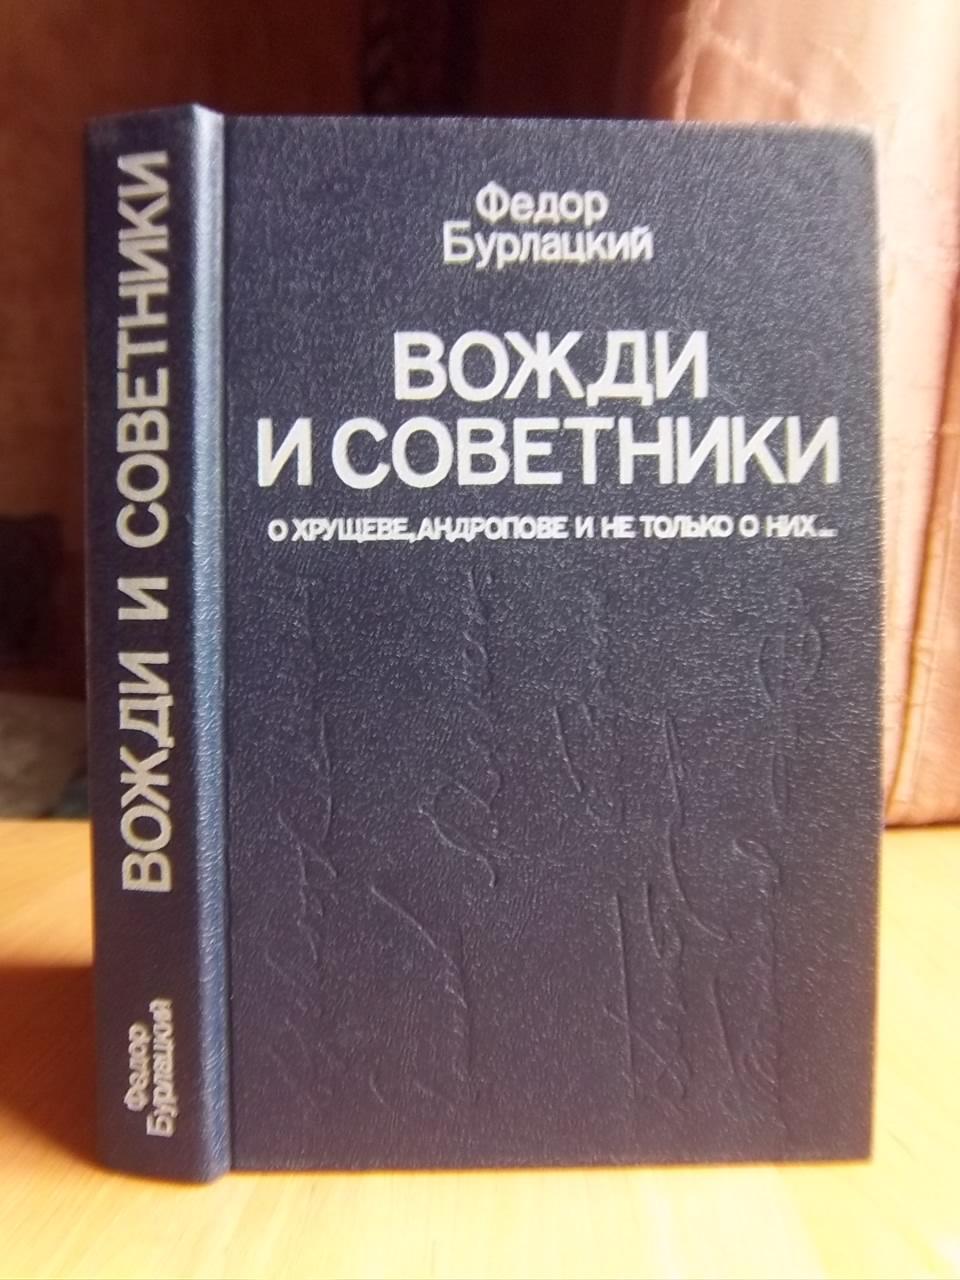 Вожди и советникиО Хрущеве, Андропове и не только о них…